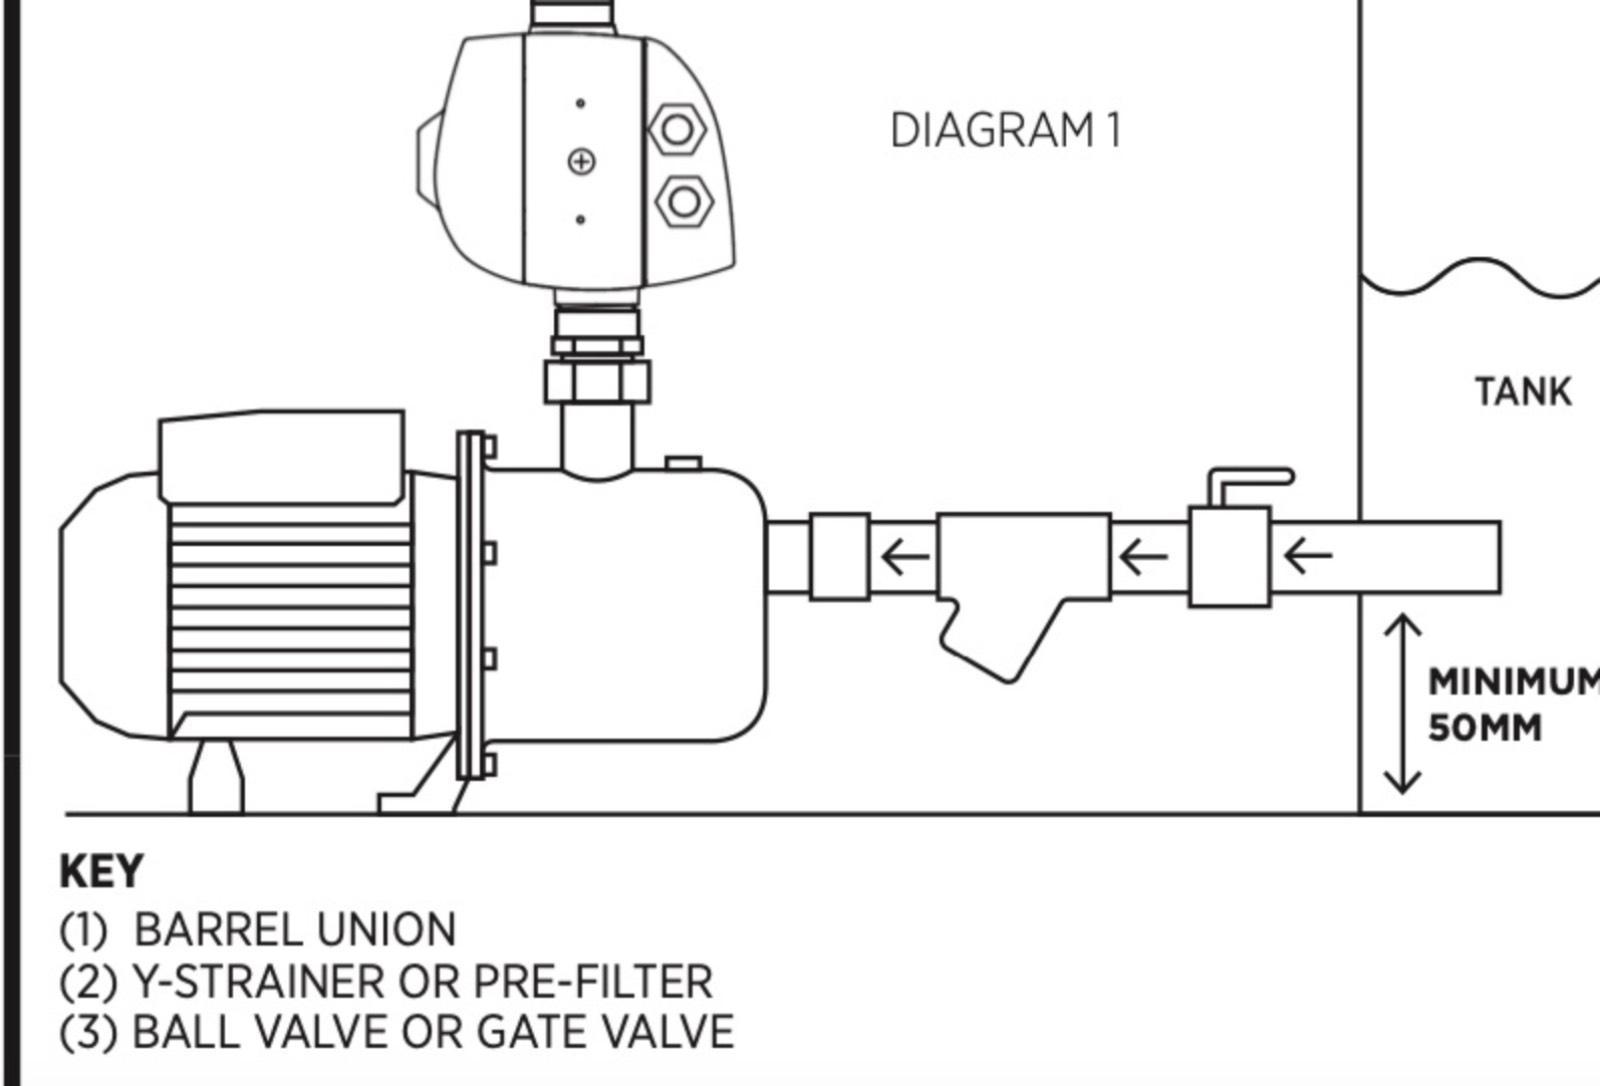 Advice on pump / pressure tank combo